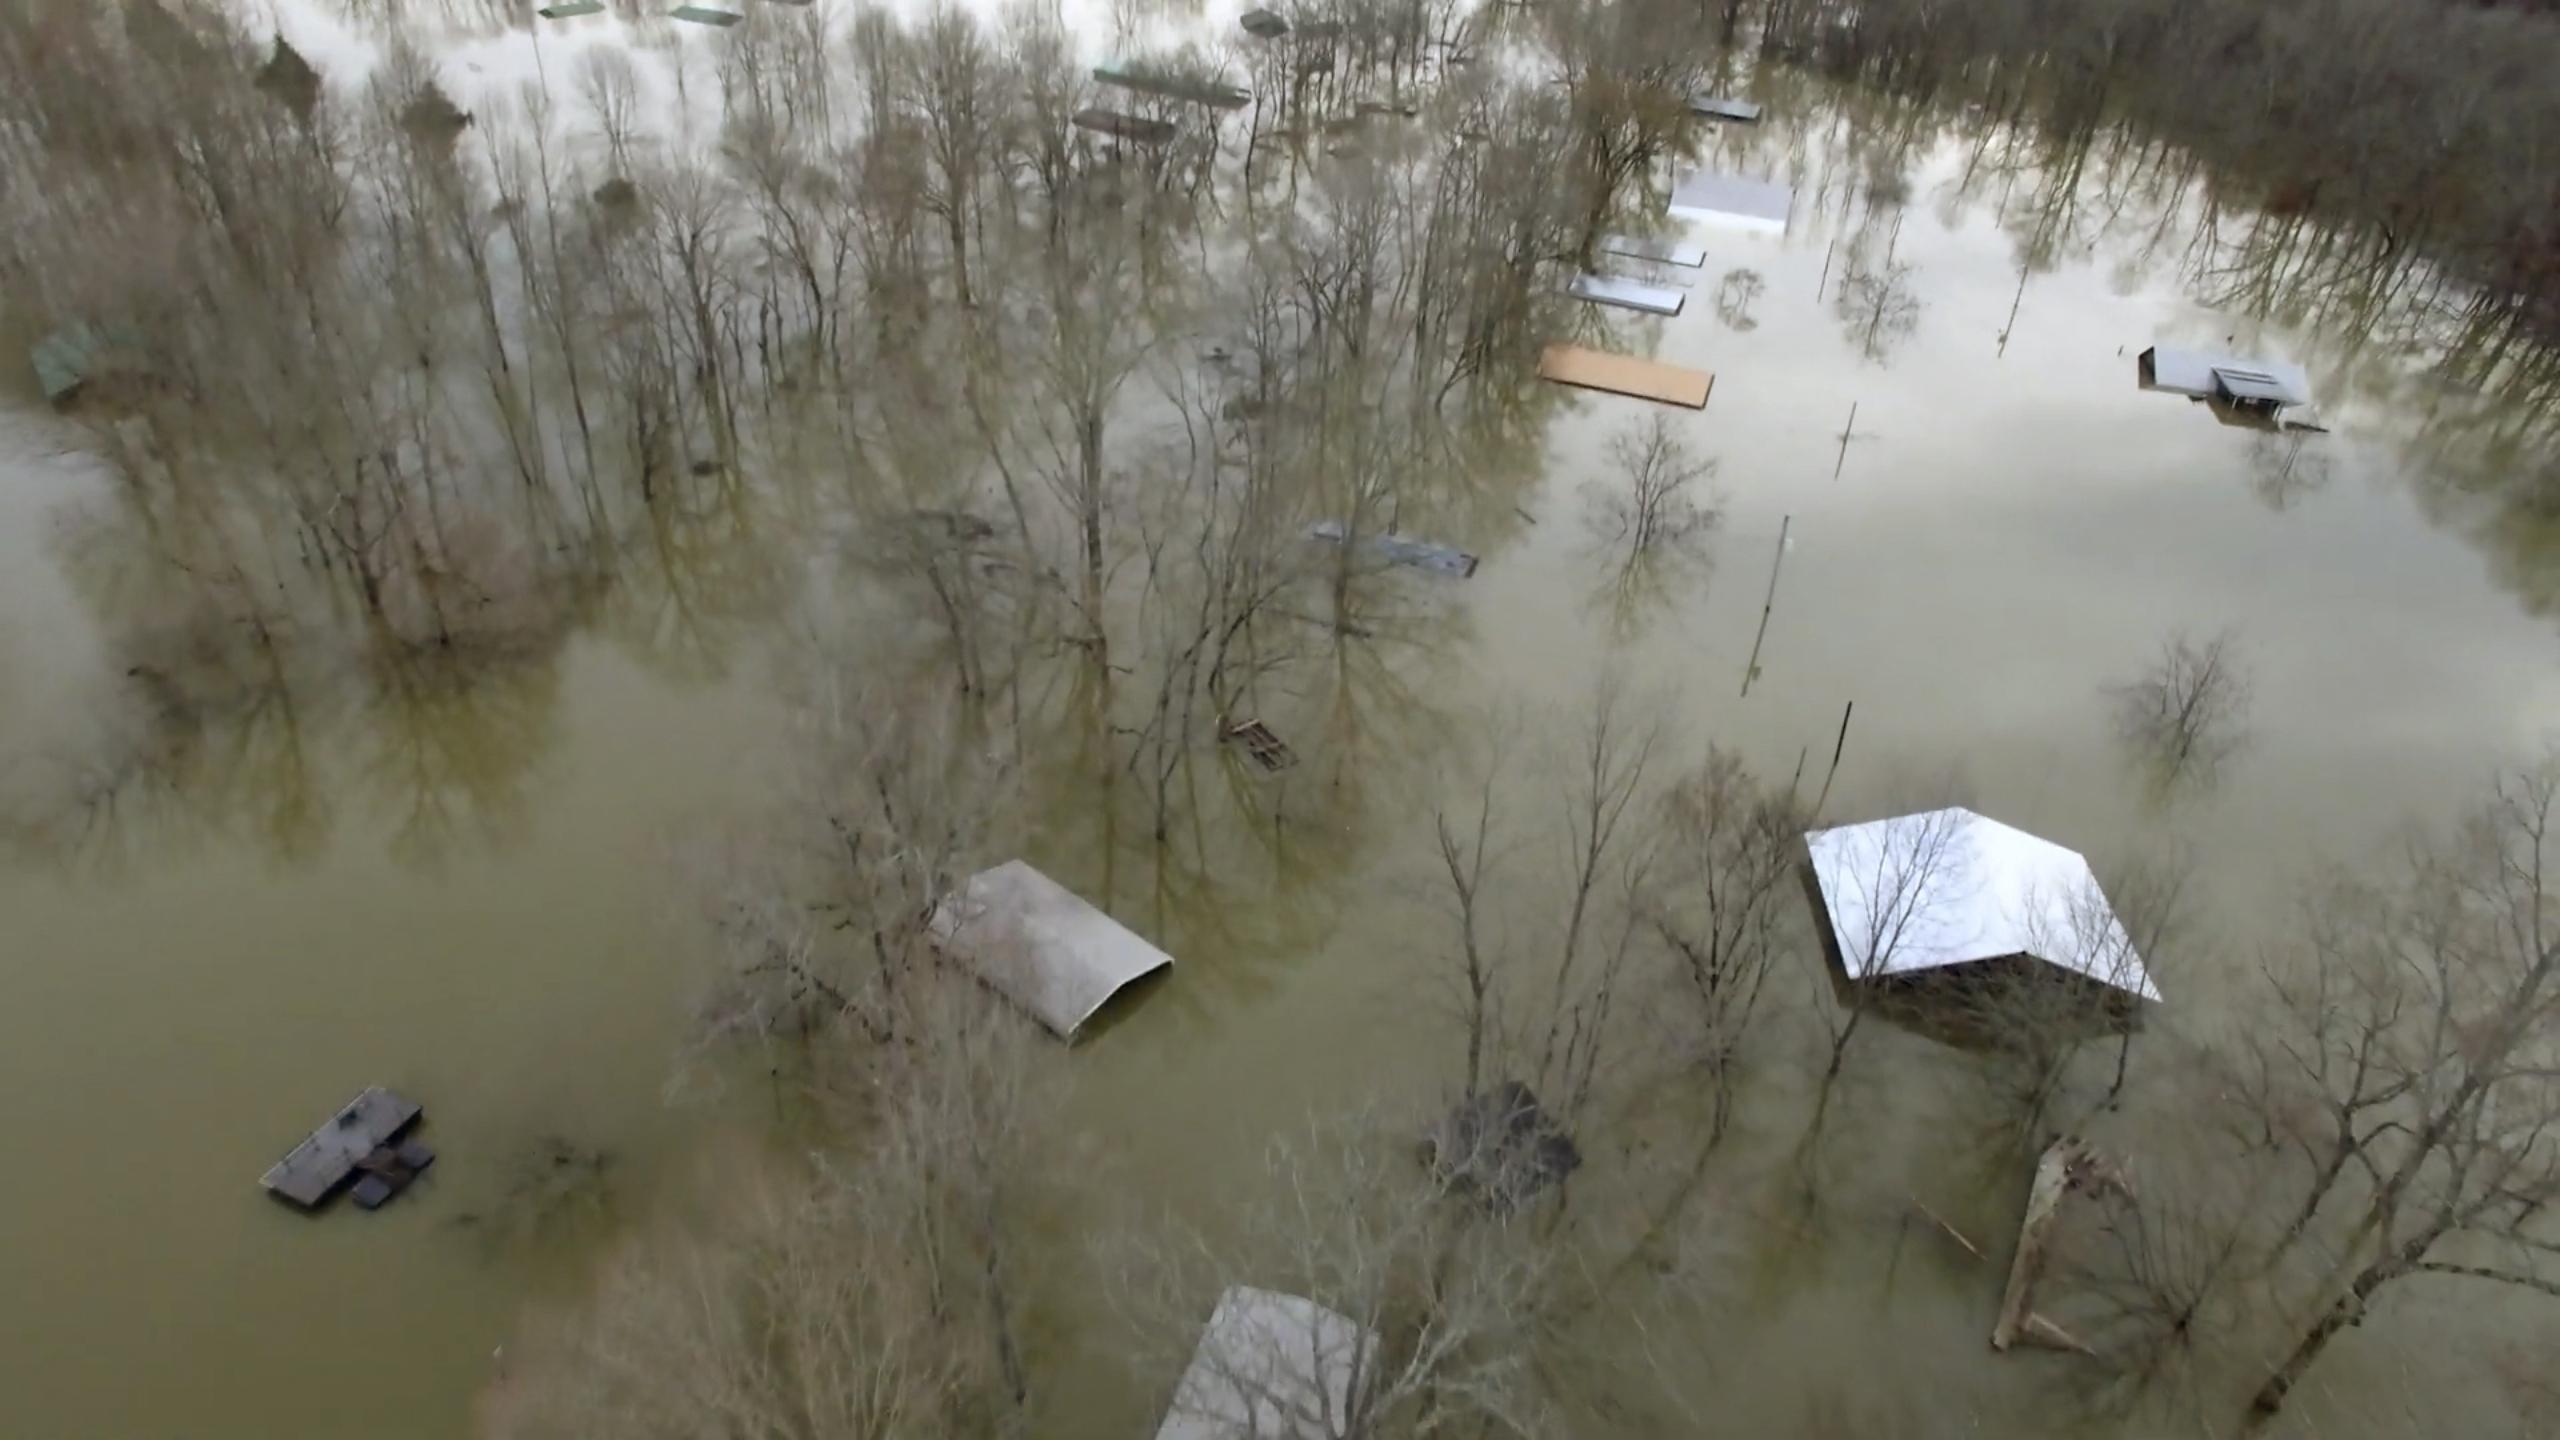 This drone photo provided by Hardin County Fire Department, Savannah, Tenn., shows flooding on Feb. 15, 2020 in Savannah, Tenn.